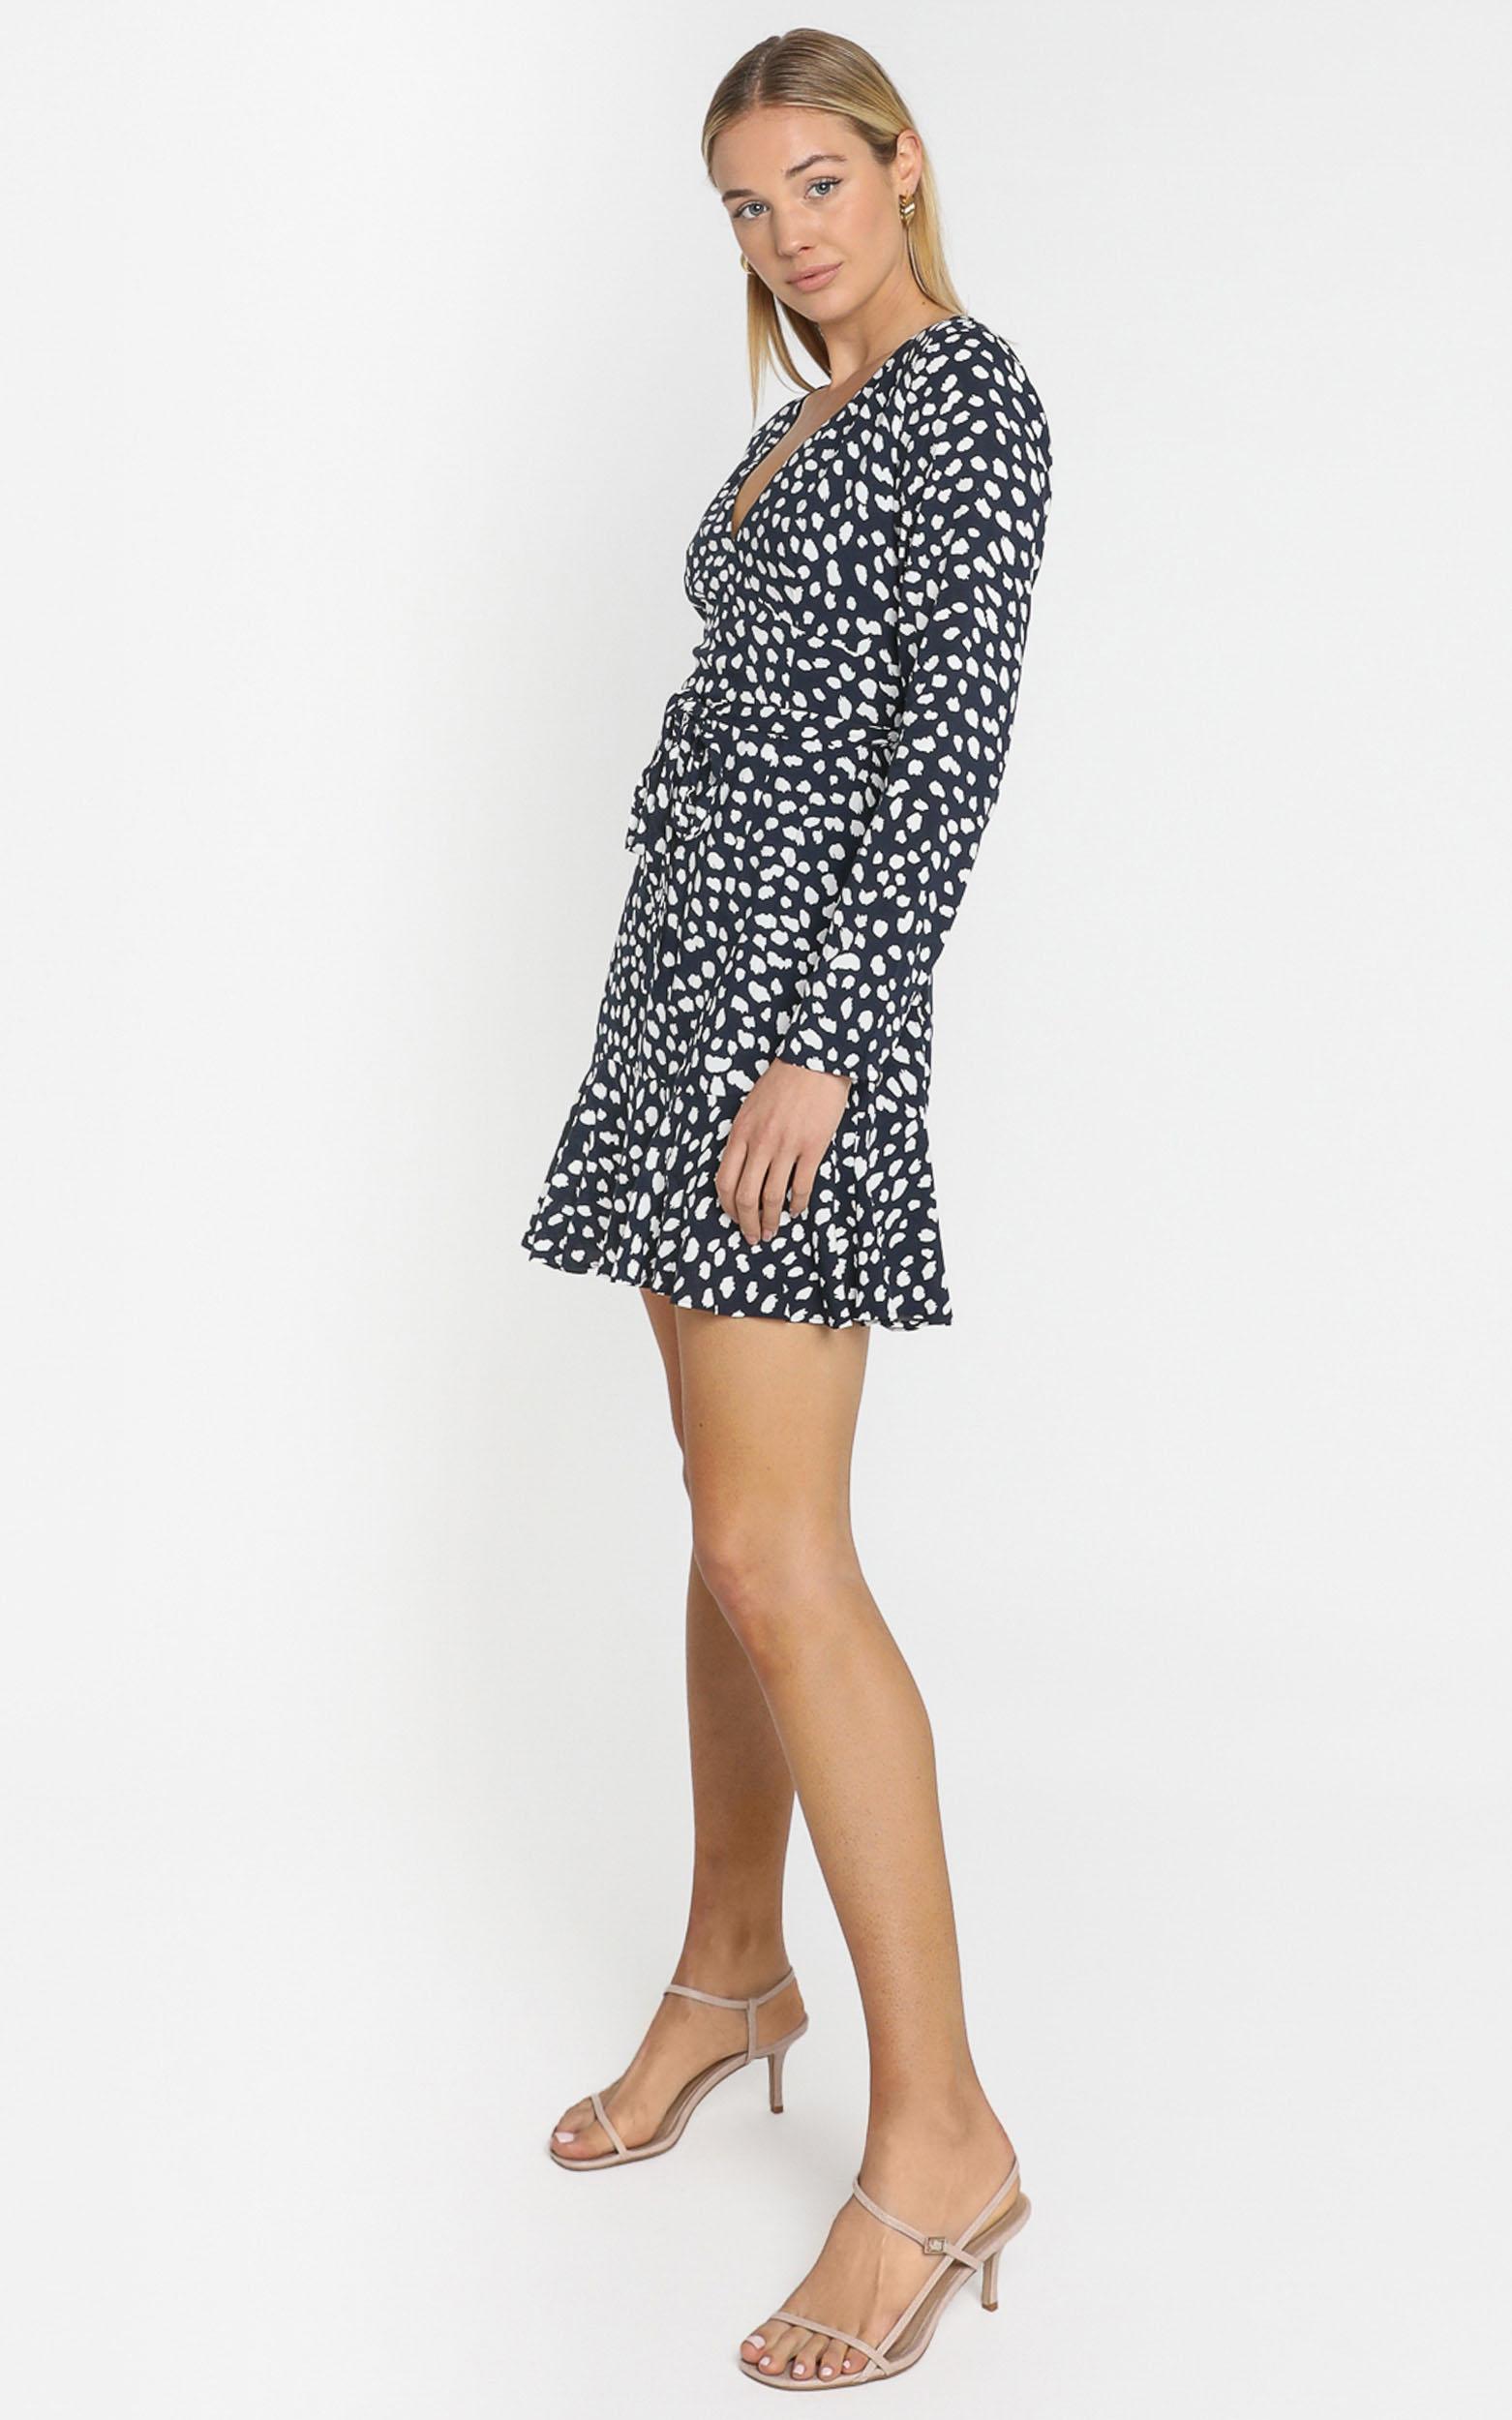 Farah Dress in Navy Spot - 6 (XS), Navy, hi-res image number null